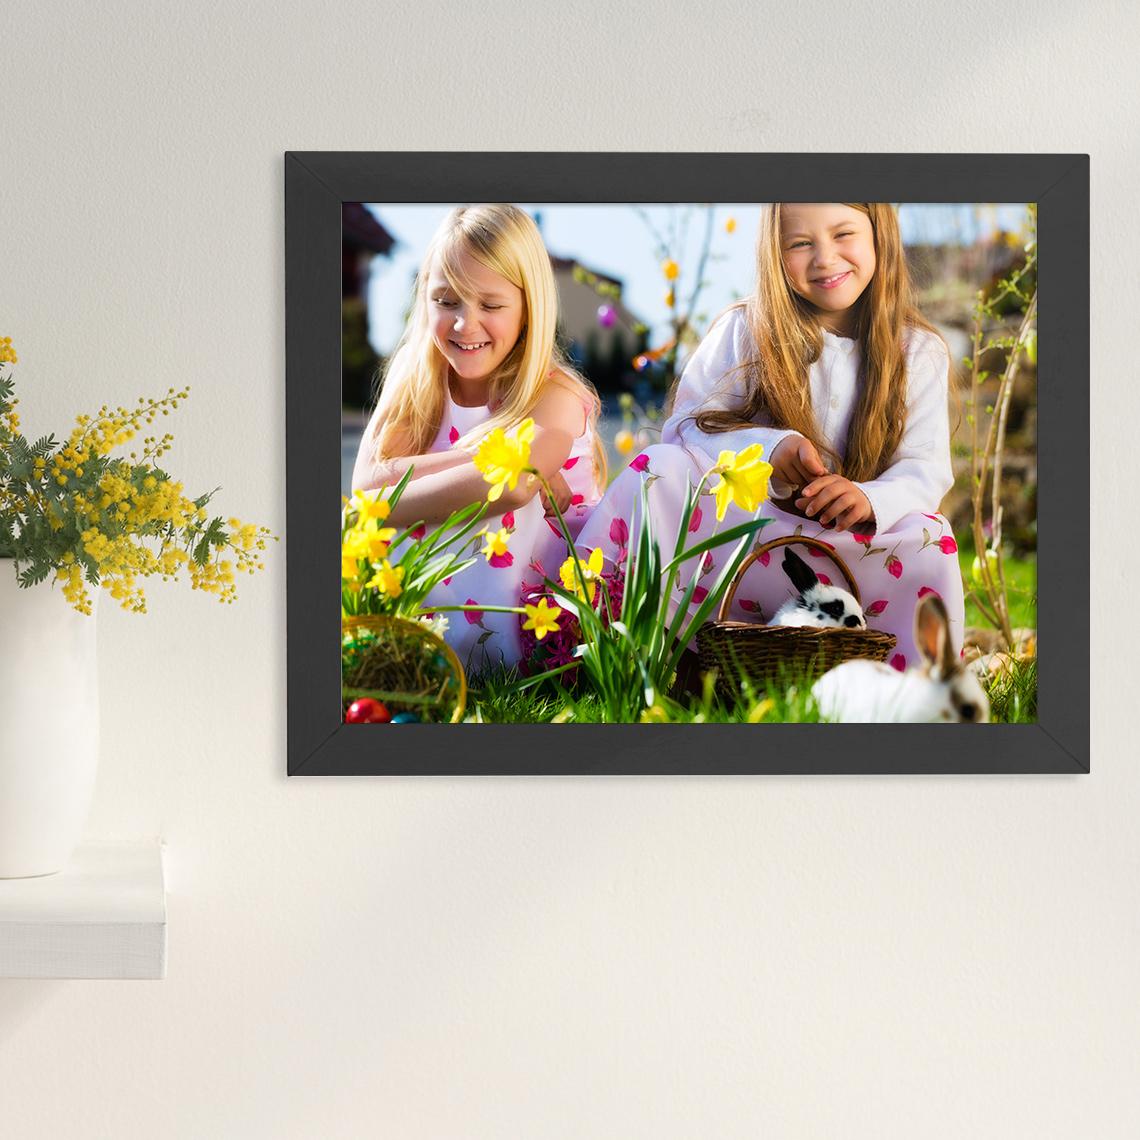 30x20 Framed Prints | Framed Photos - Truprint